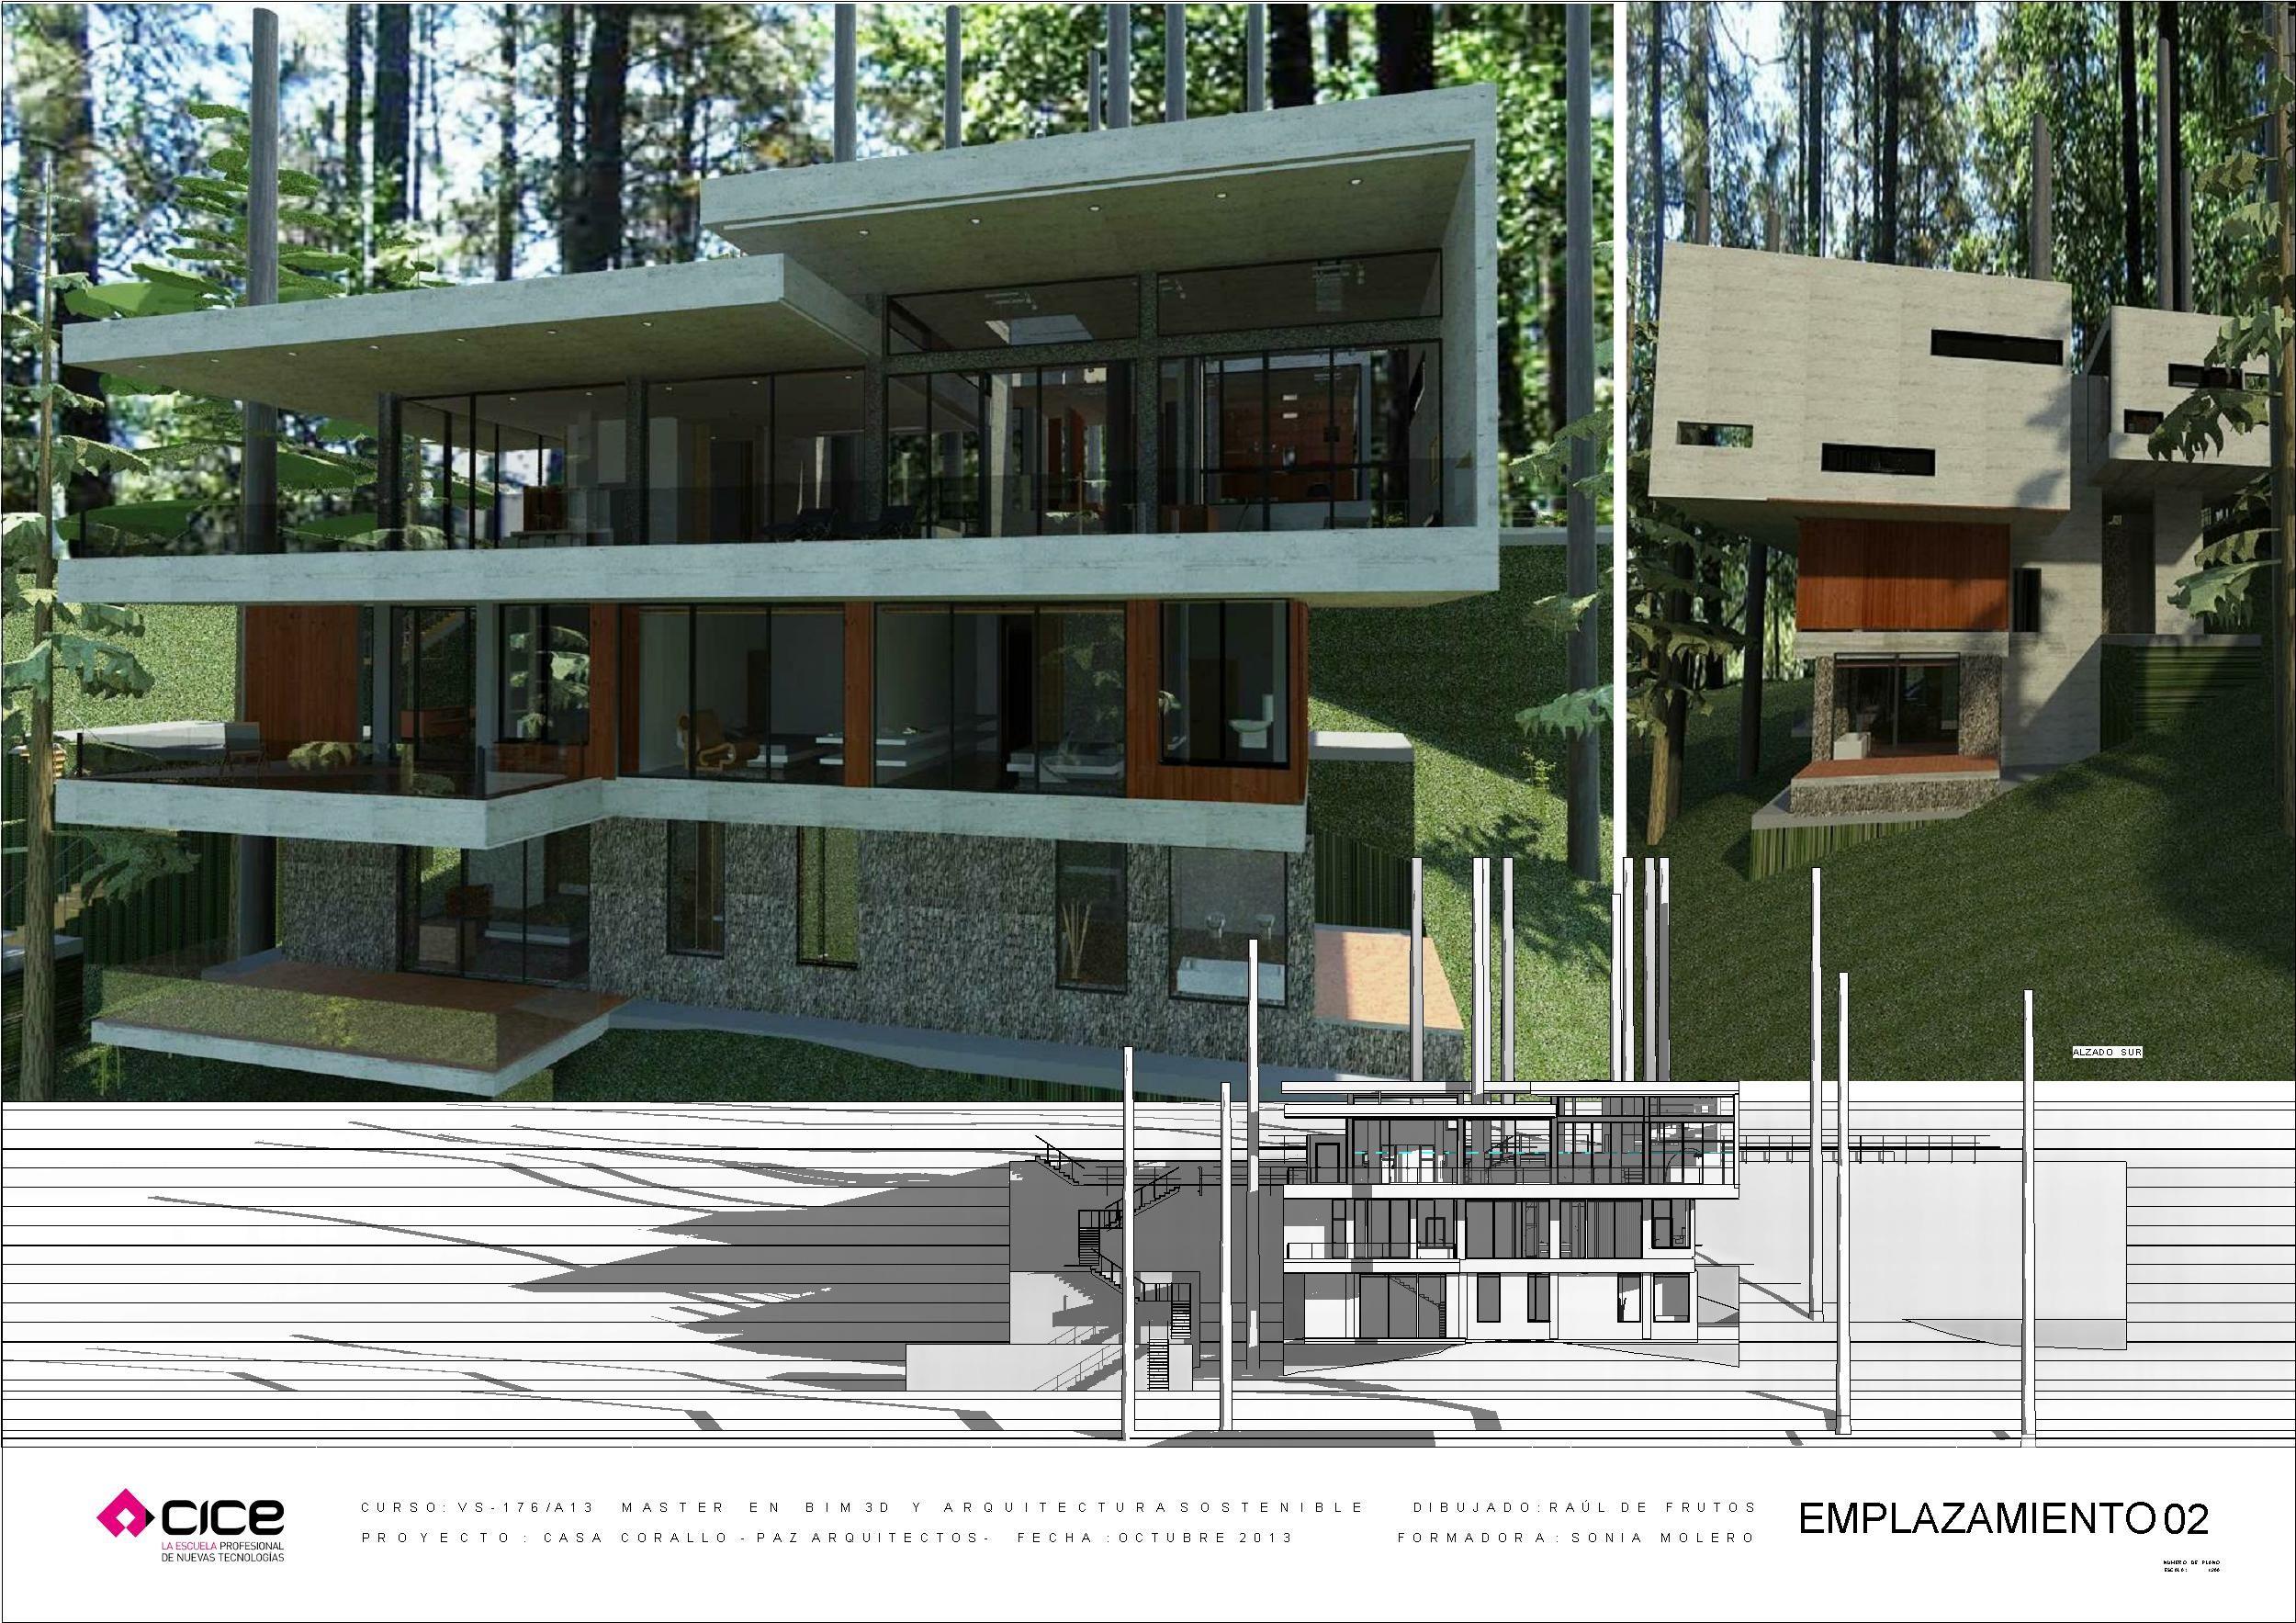 Cice 2013 casa corallo paz arquitectos por ra l de for Casa moderna revit